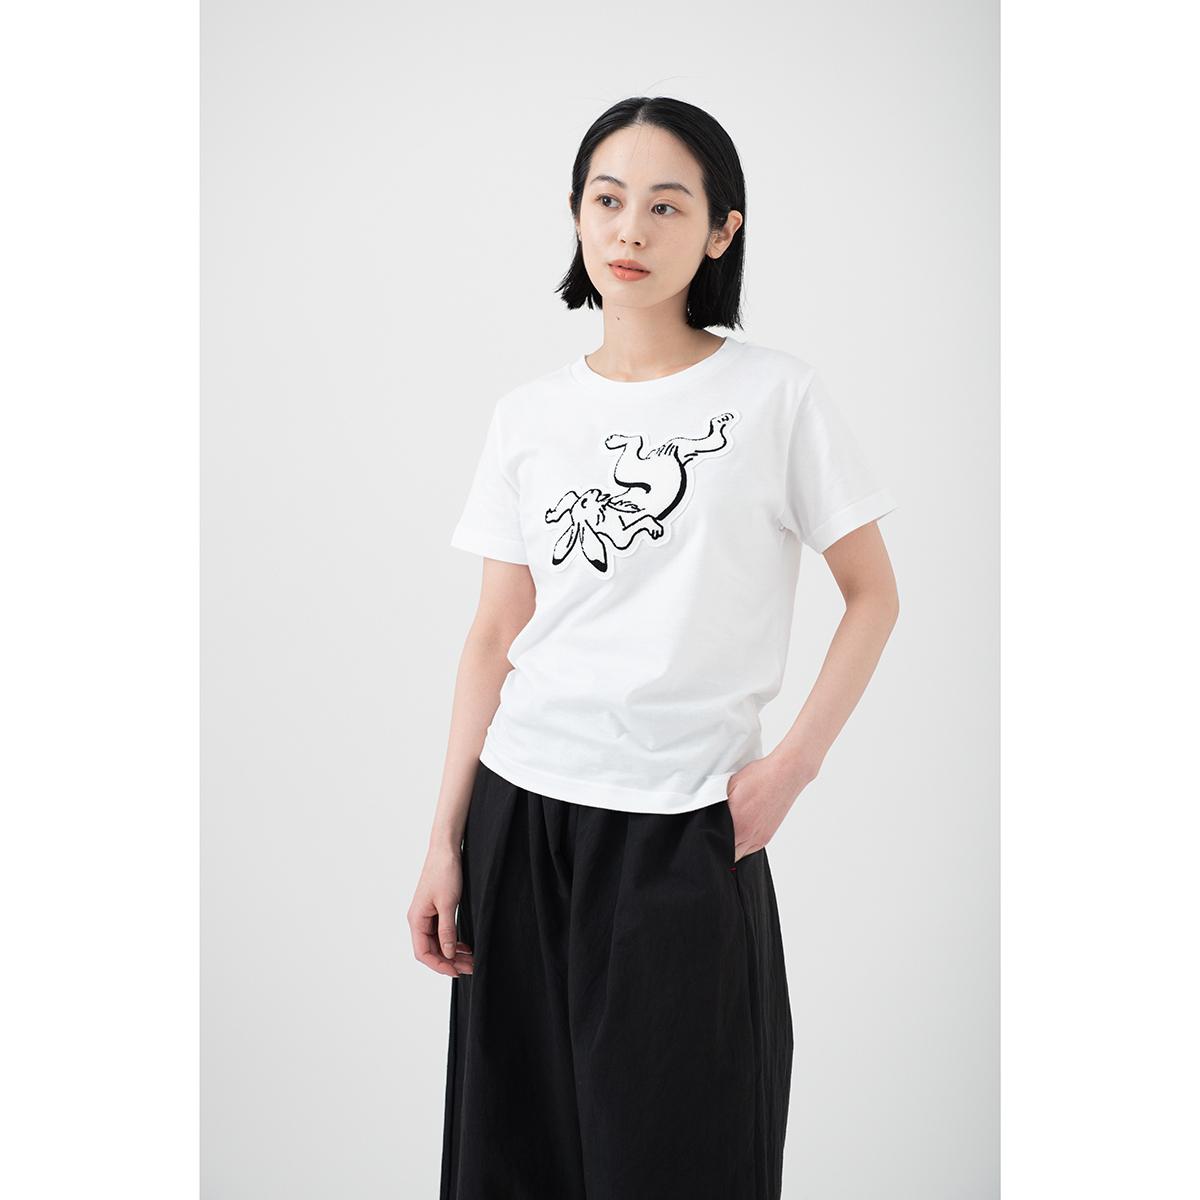 KY54-680R/Tシャツ(白)/兎